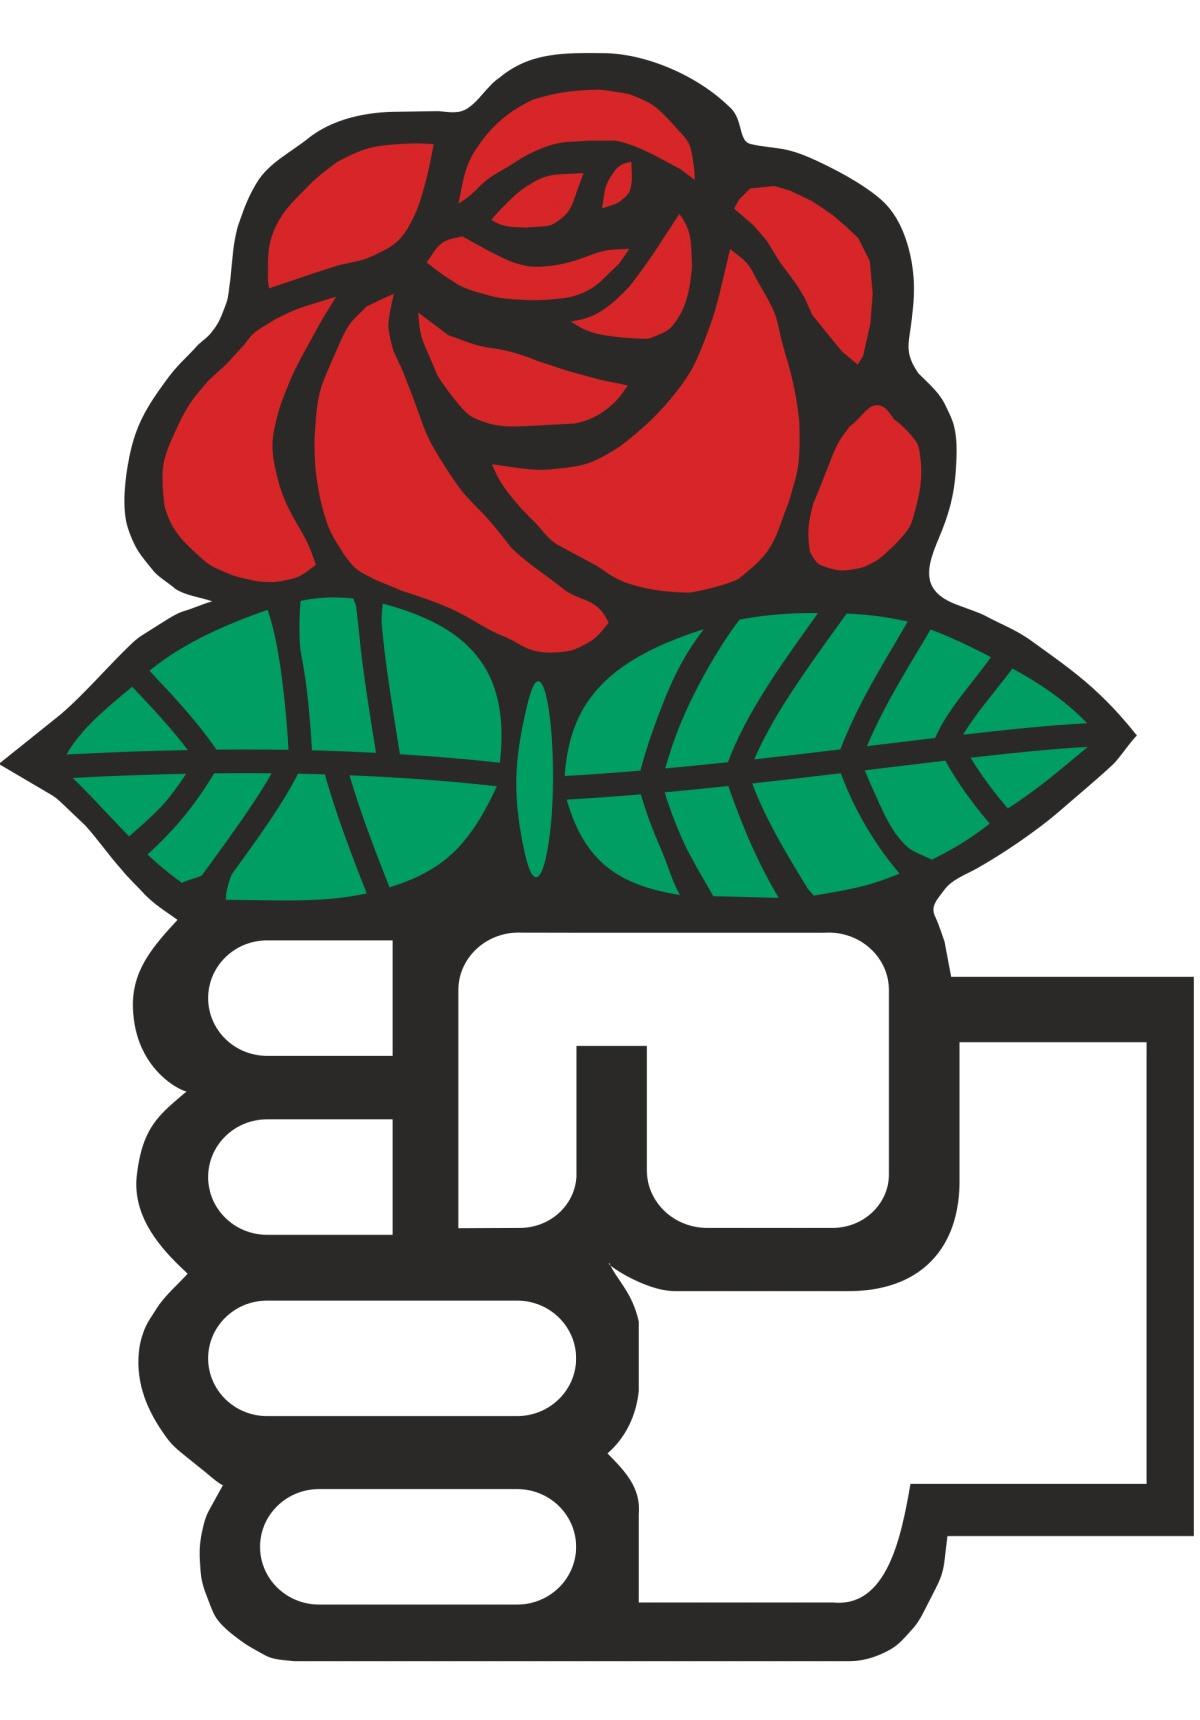 00 Red Rose (Socialism)